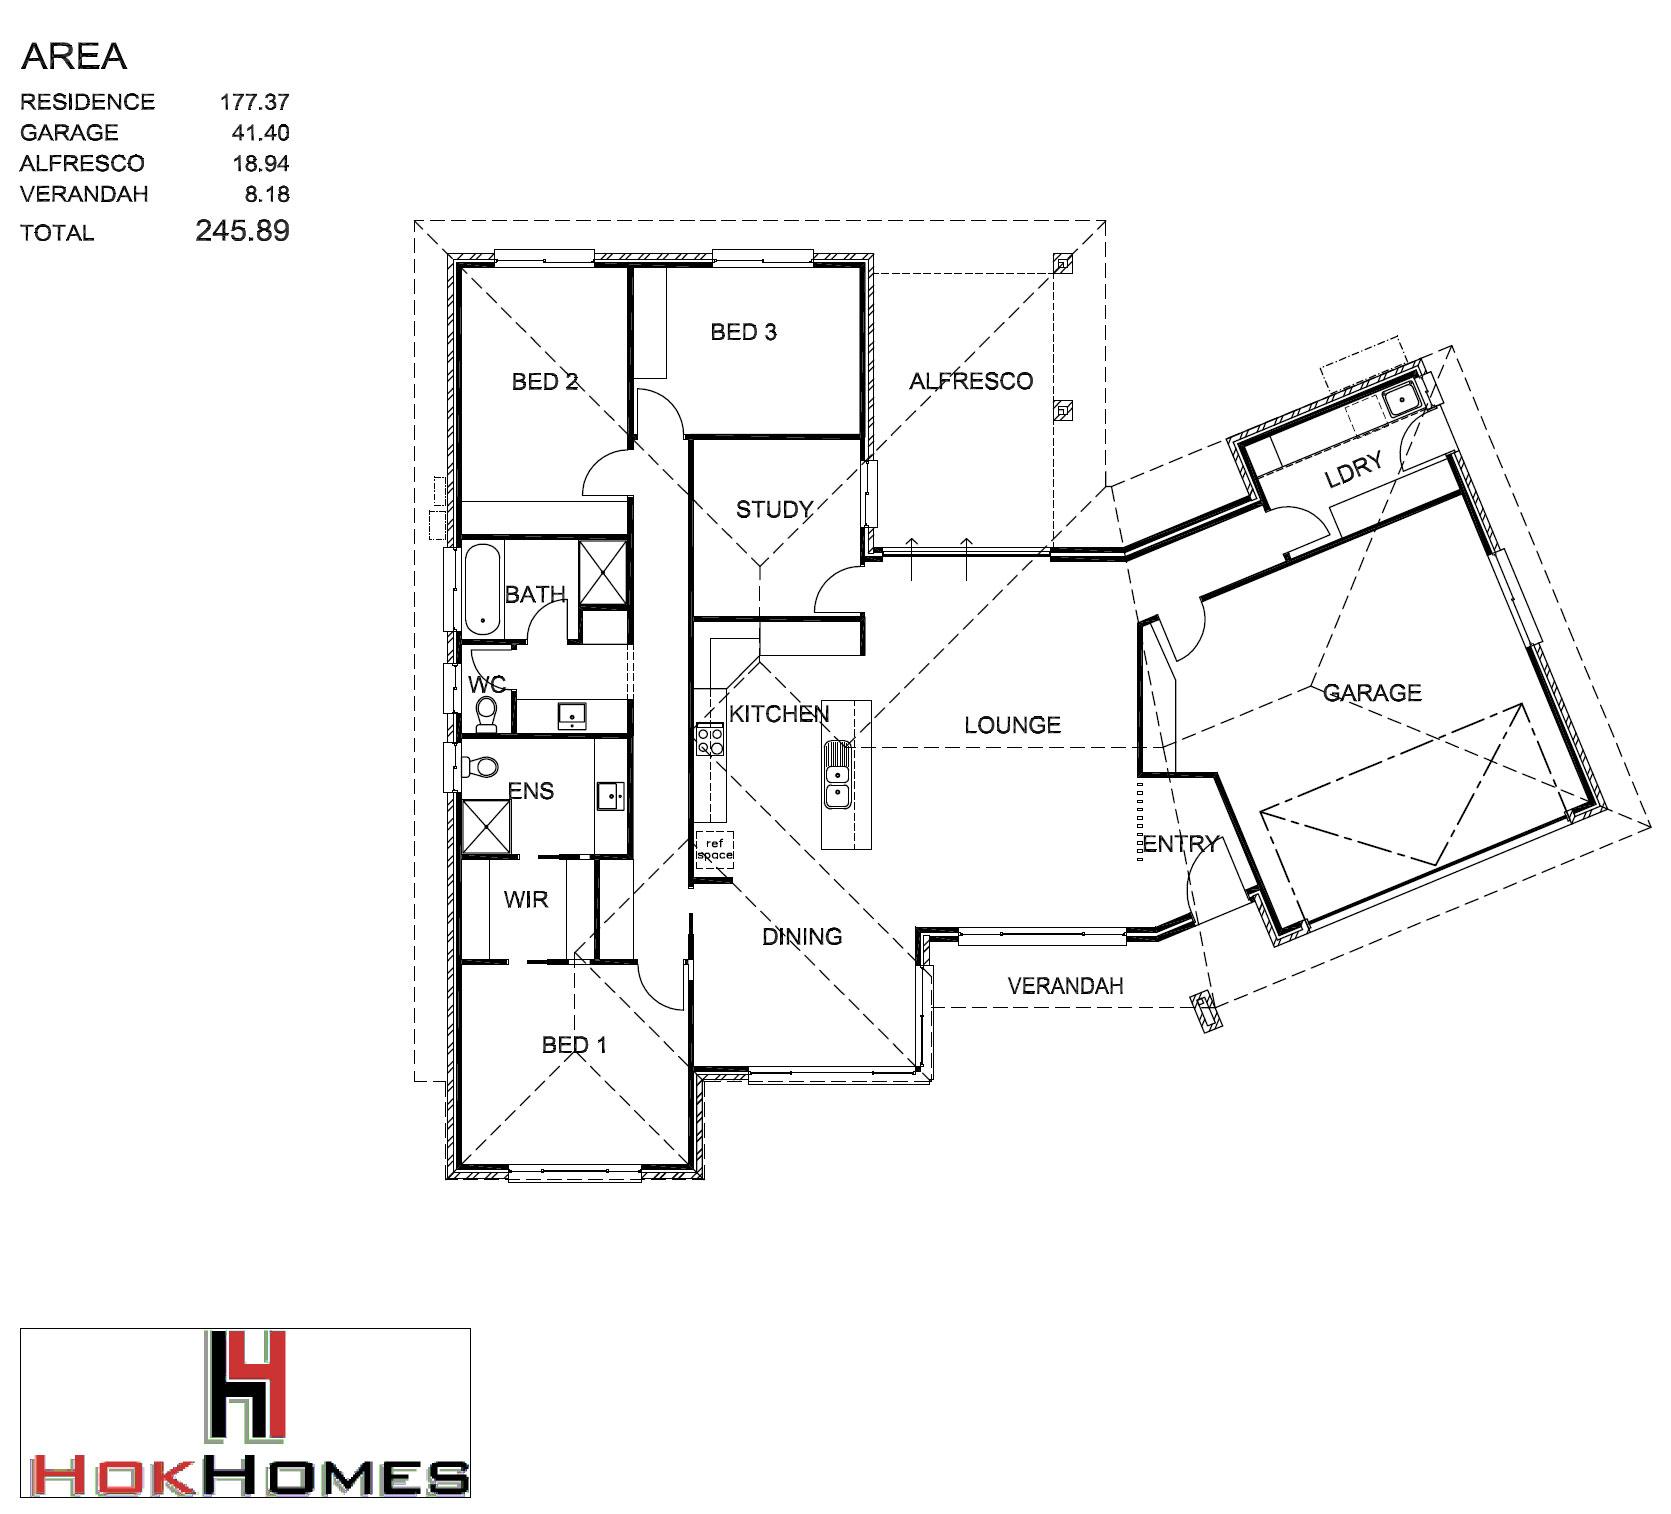 5 Emerald Drive, Mount Gambier through Hok Homes - Floor plan